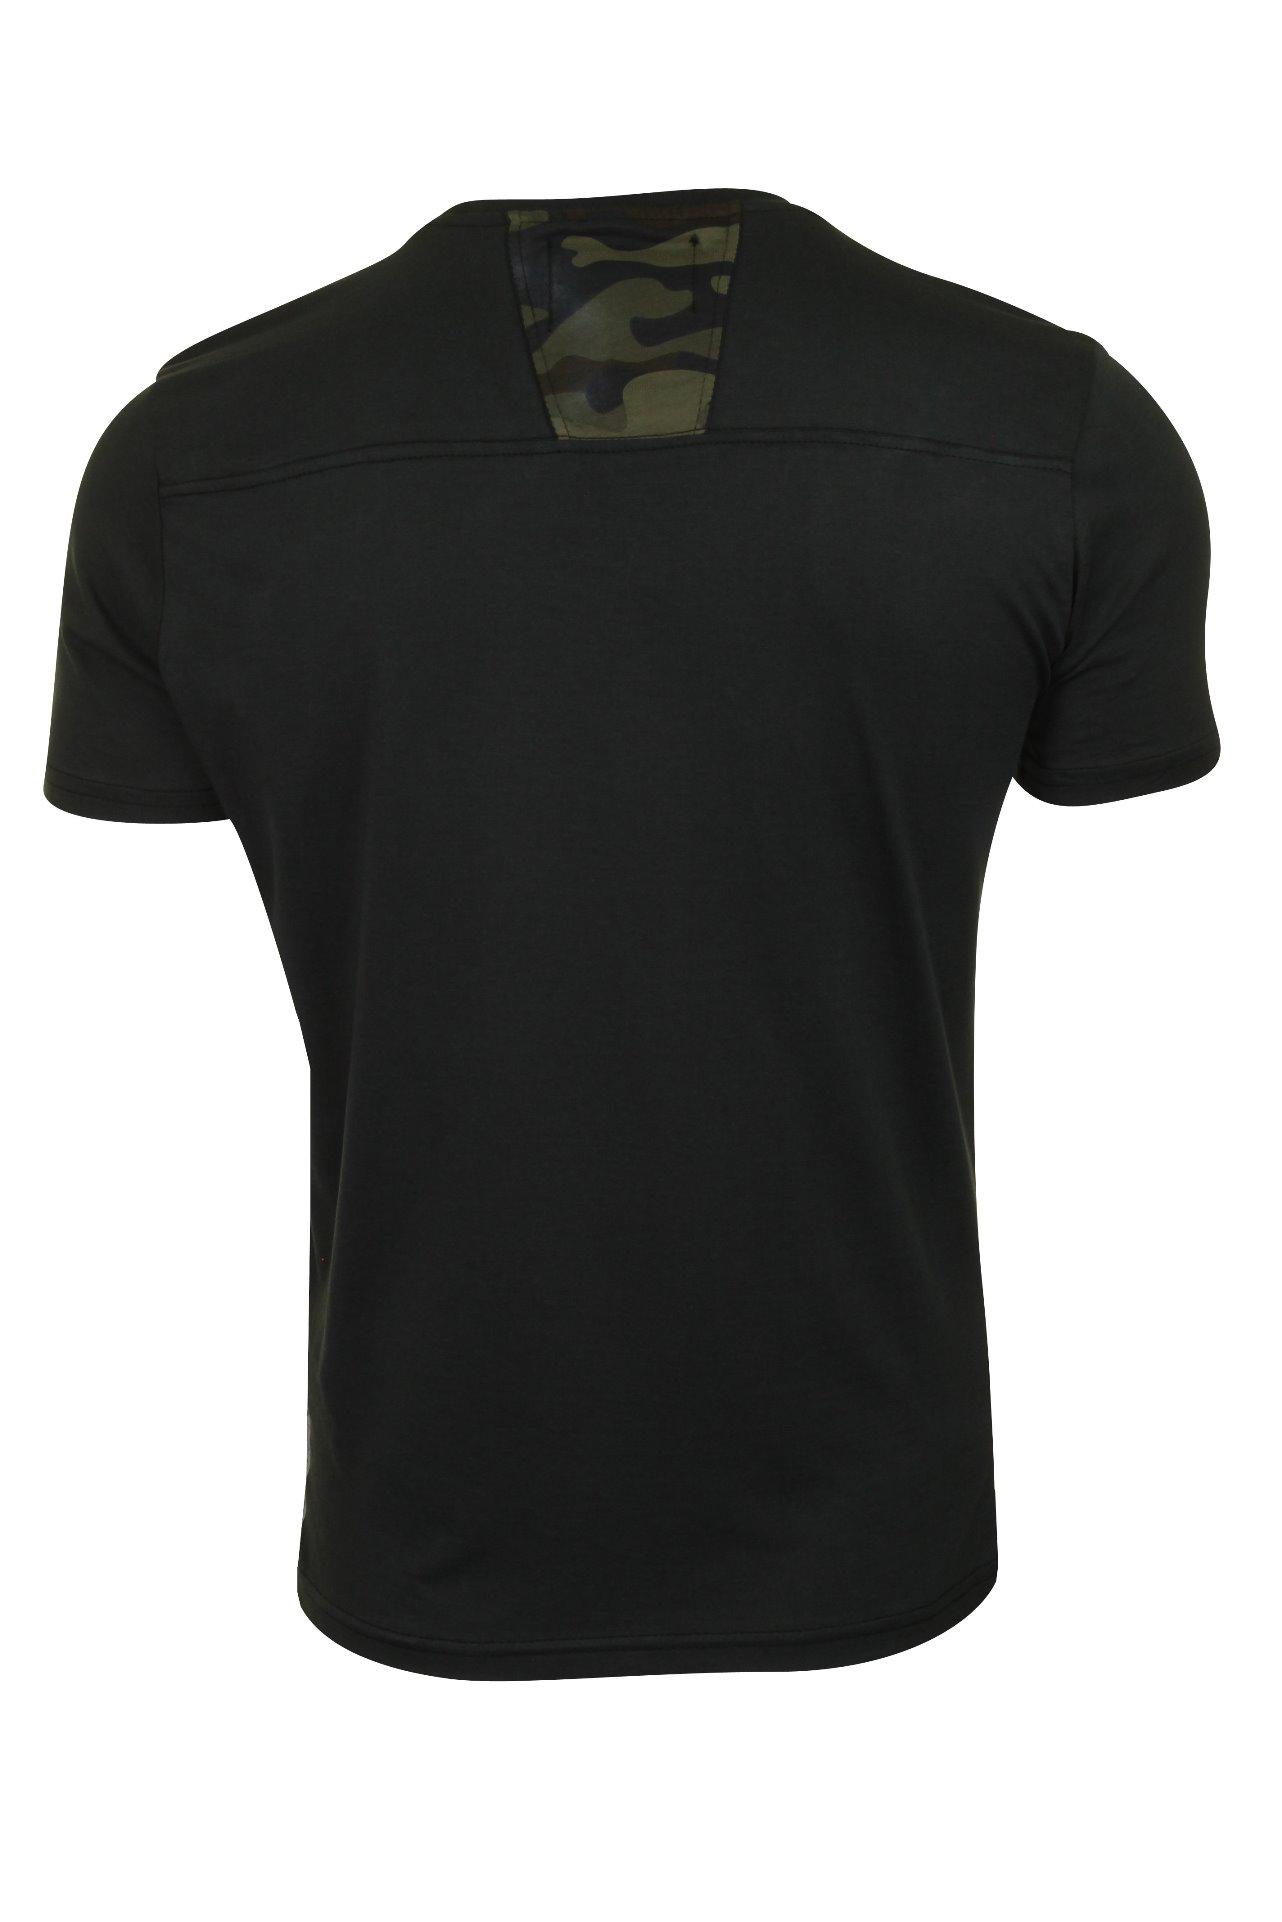 Duck-and-Cover-Hombre-Camiseta-039-Balzar-039 miniatura 5